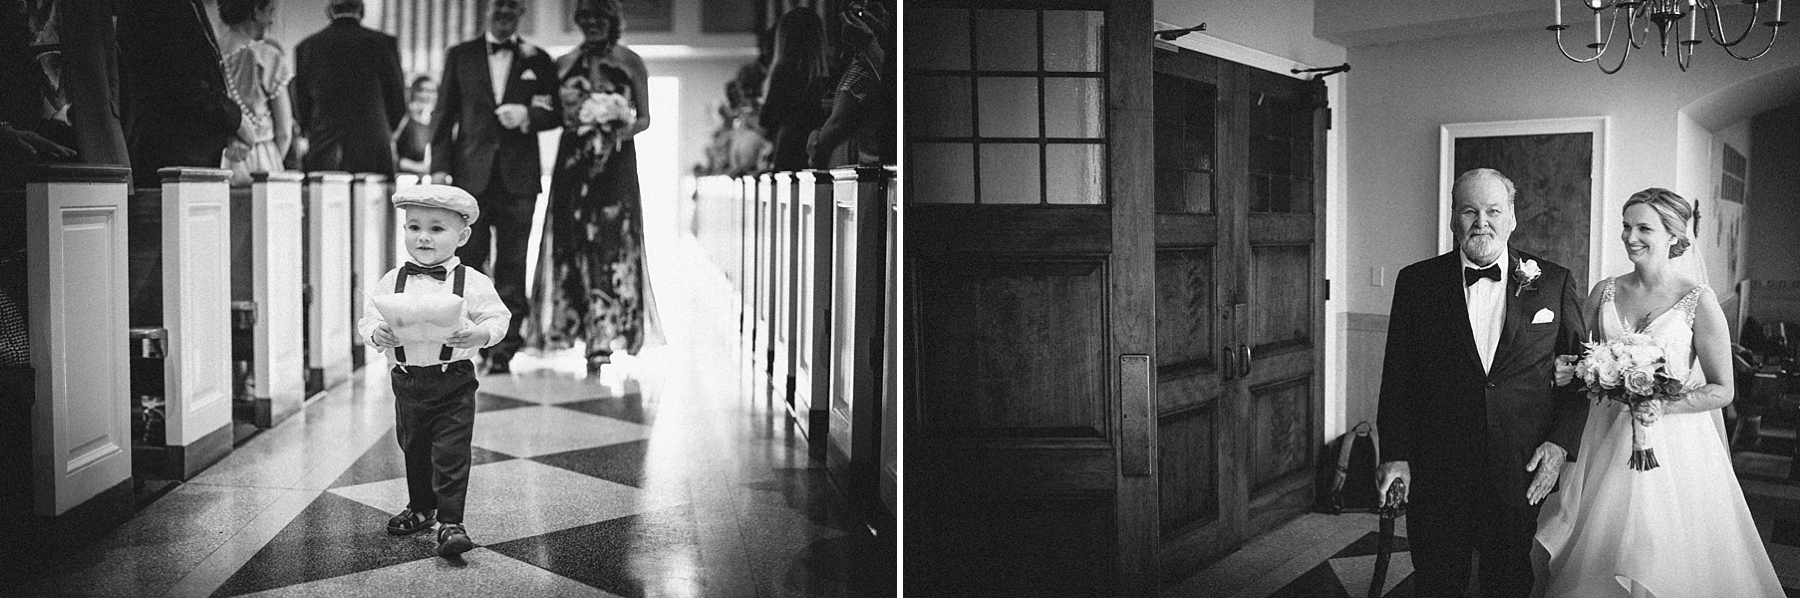 shadow_brook_nj_wedding_photographer_monmouth_county_0010.jpg